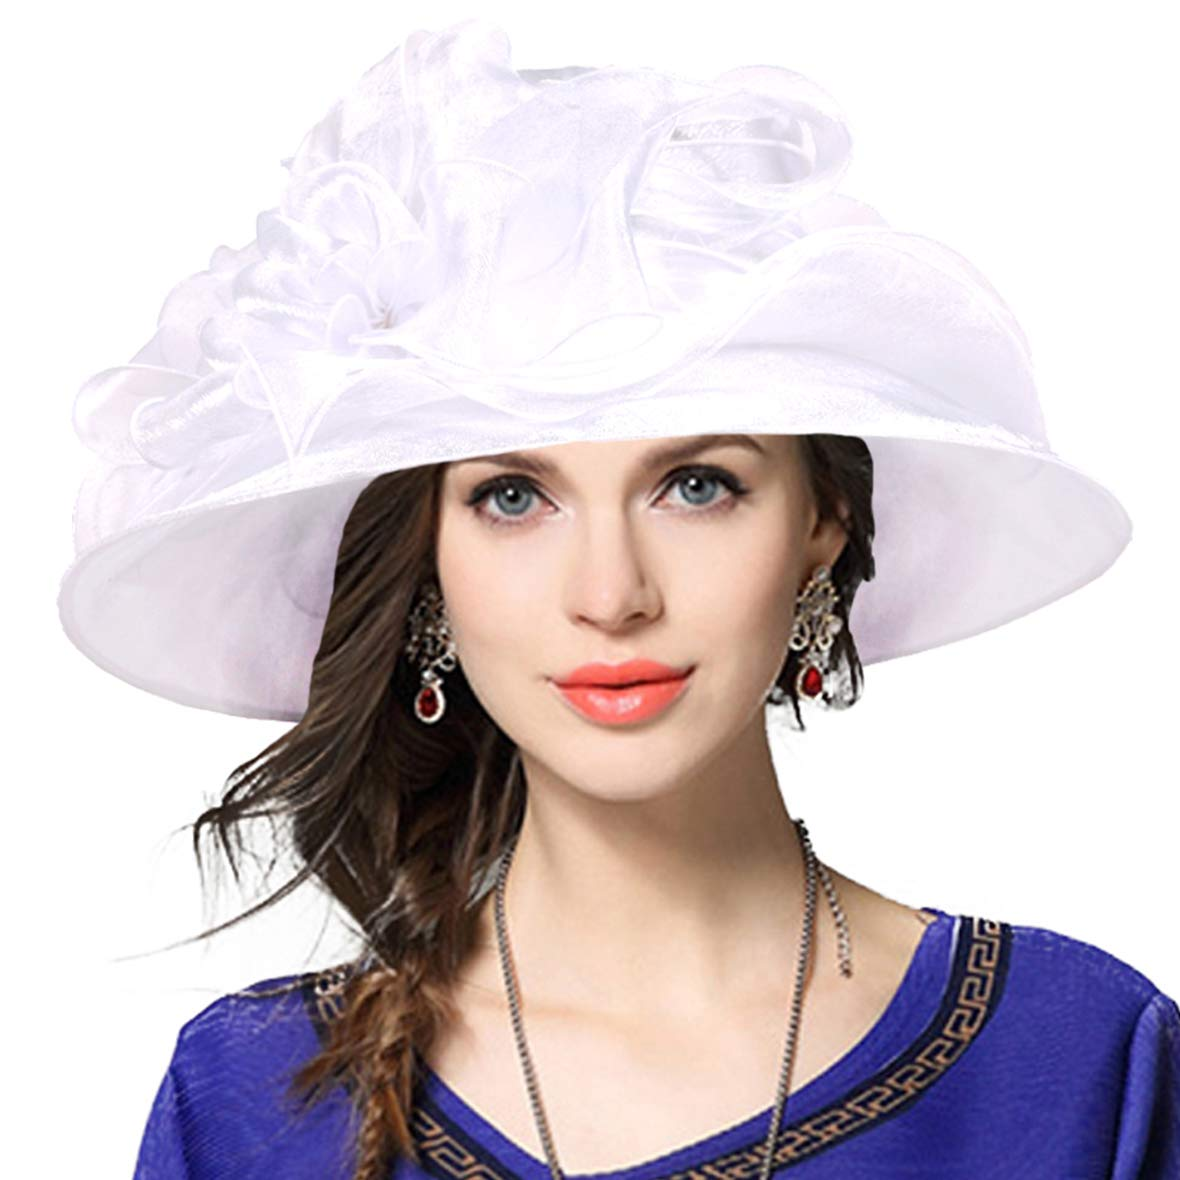 Plainwhite JESSE · RENA Women's Church Derby Dress Fascinator Bridal Cap British Tea Party Wedding Hat